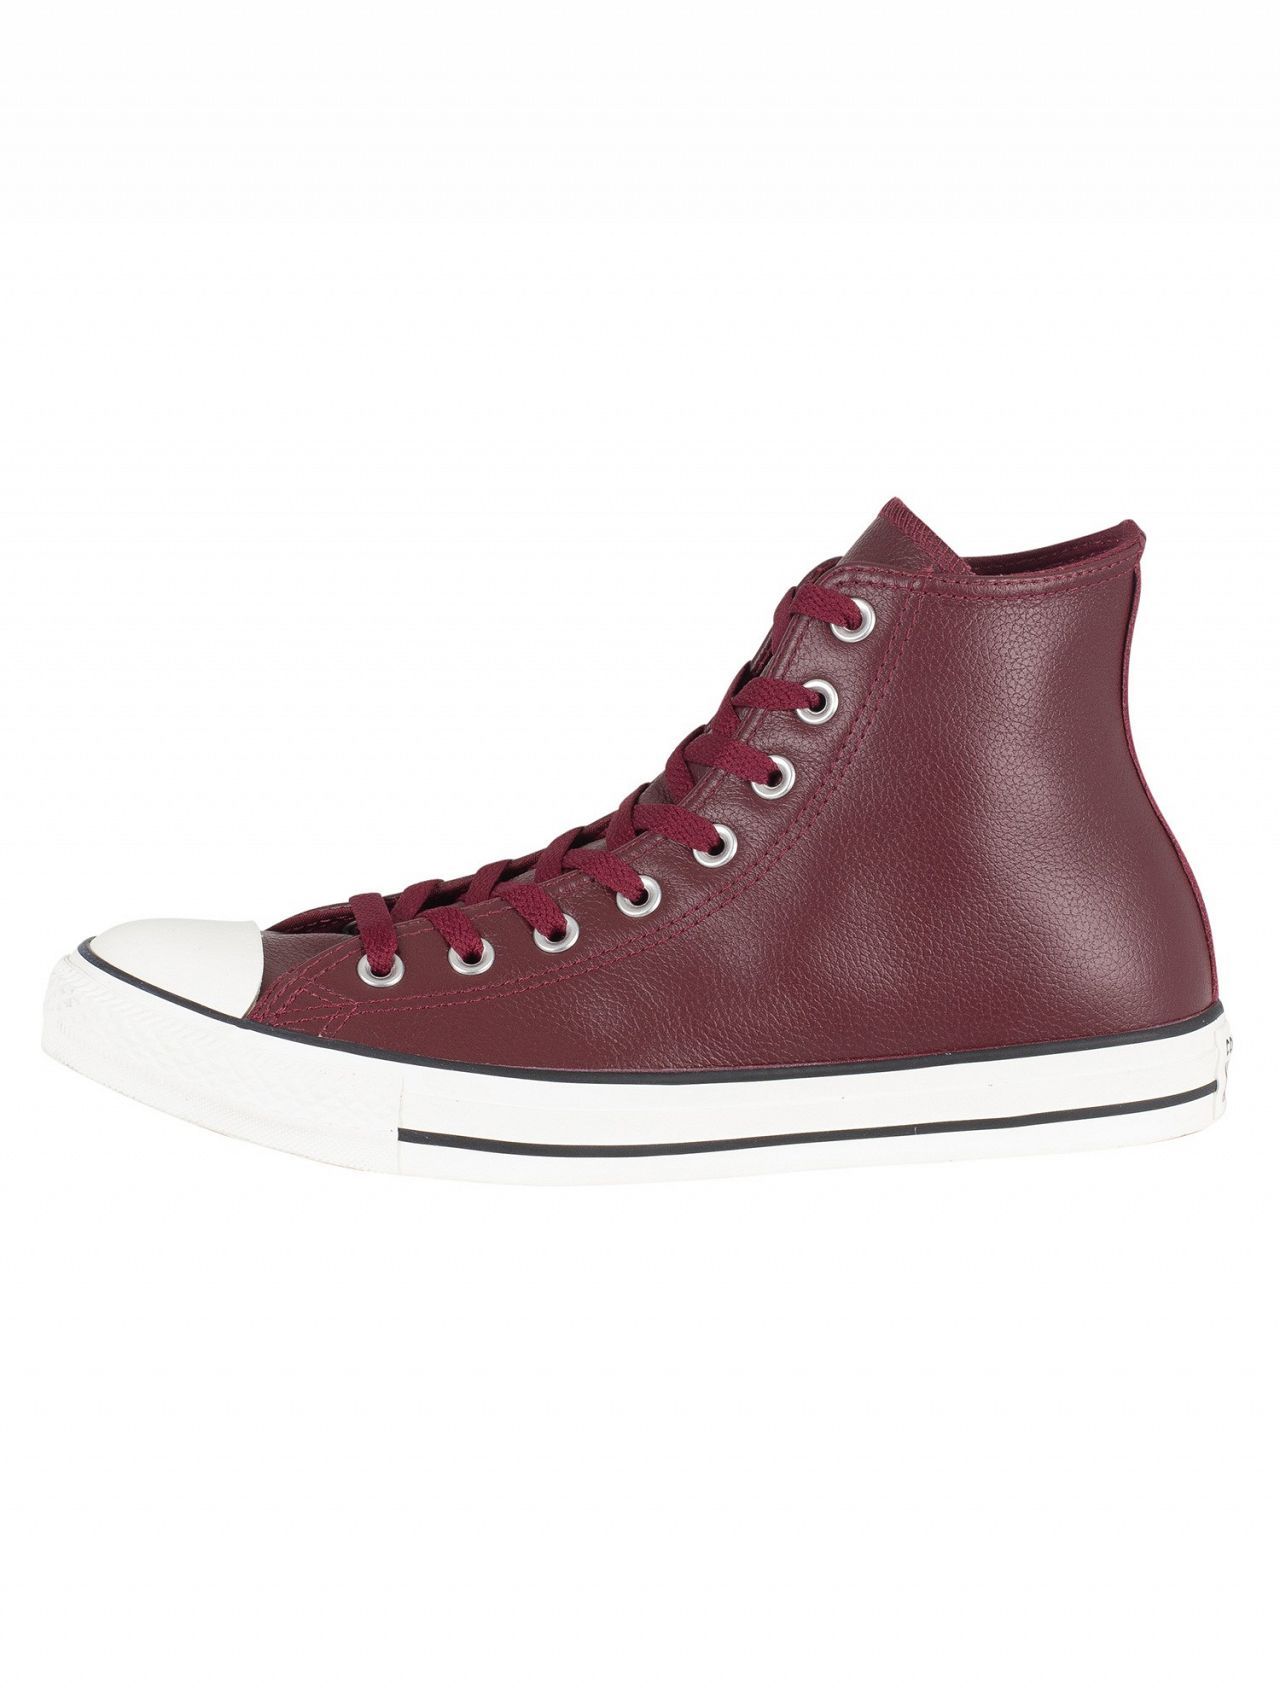 3261548c6974 Converse Dark Burgundy CT All Star Hi Leather Trainers